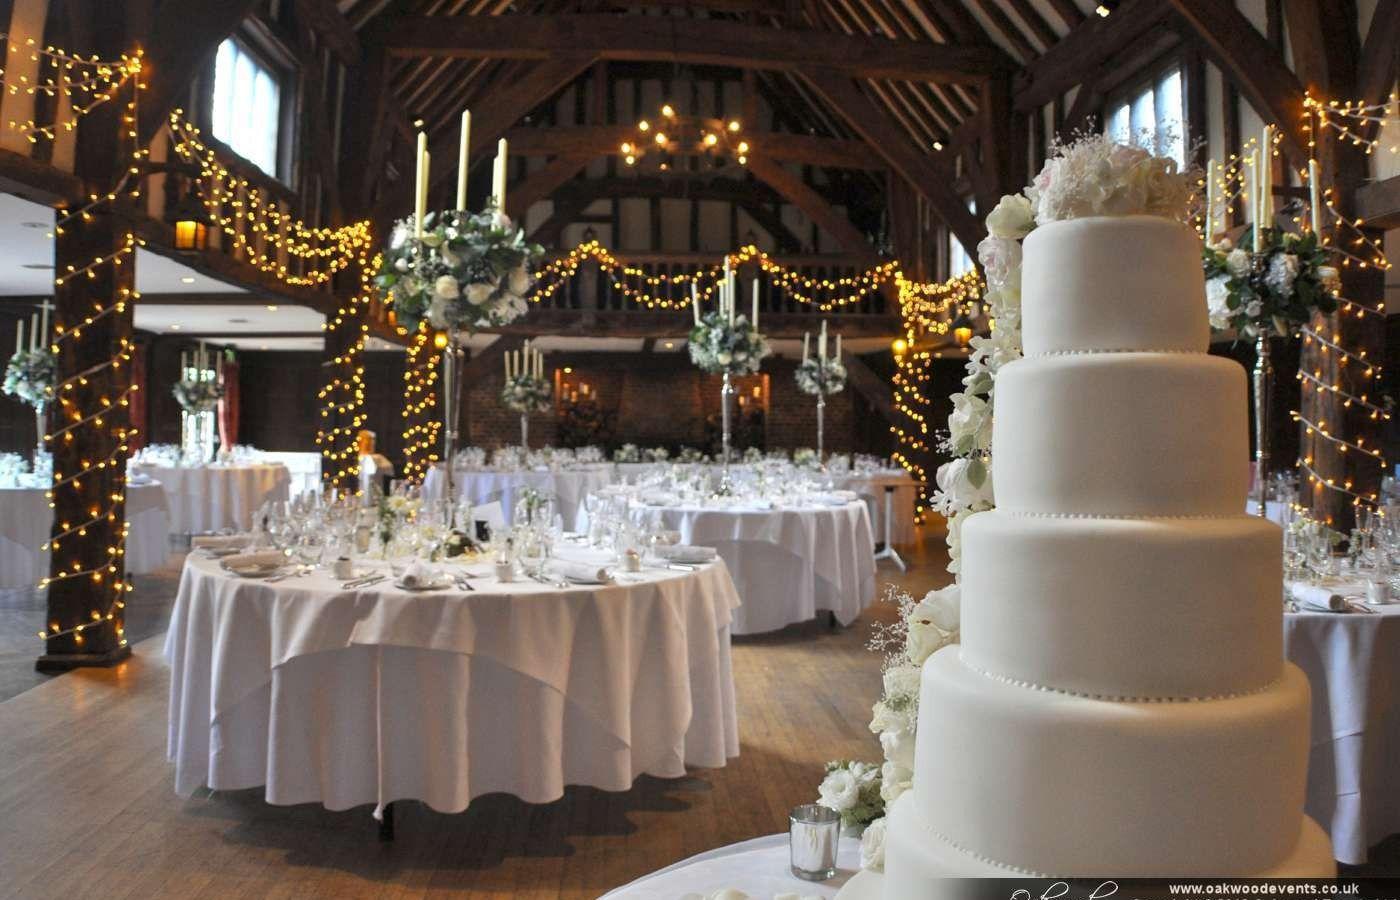 great fosters weddings - Google Search